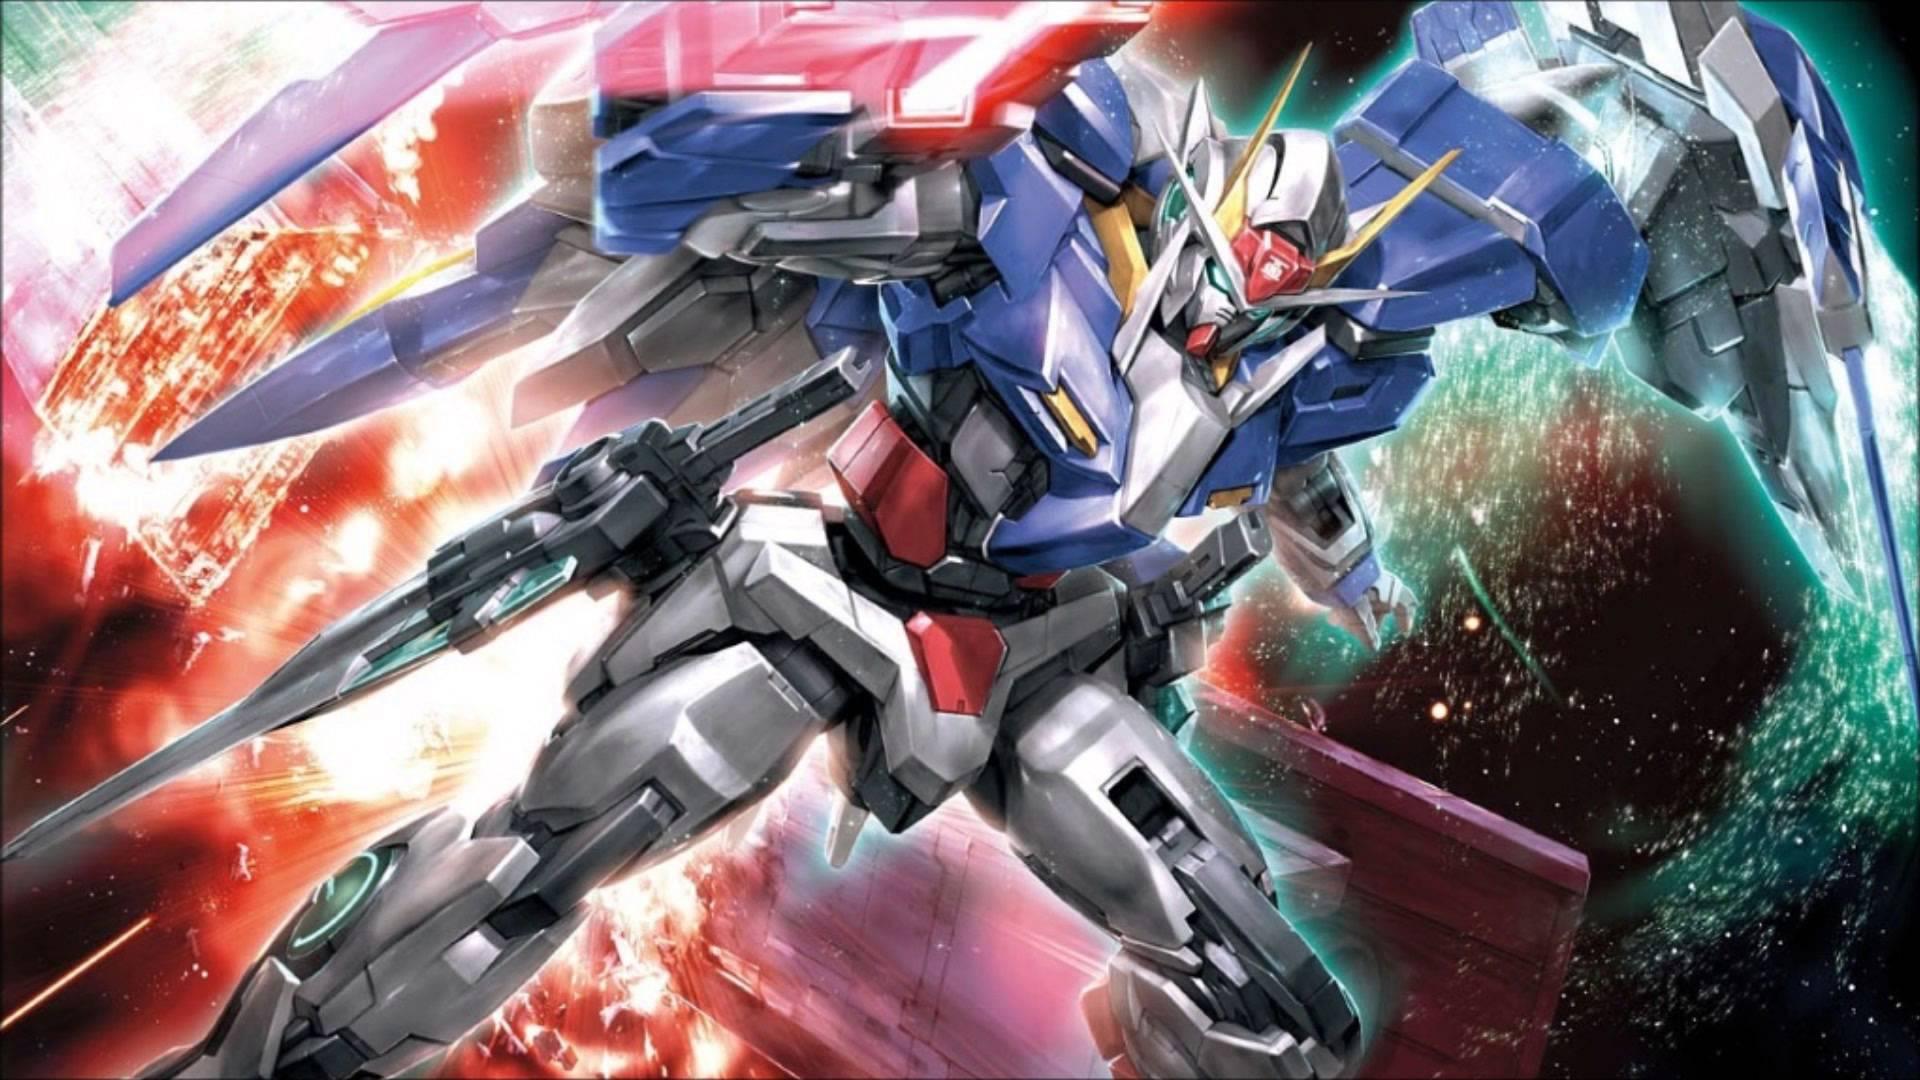 0-RAISER - Gundam 00 OST 4 - 19 (High Quality 1080p HD)